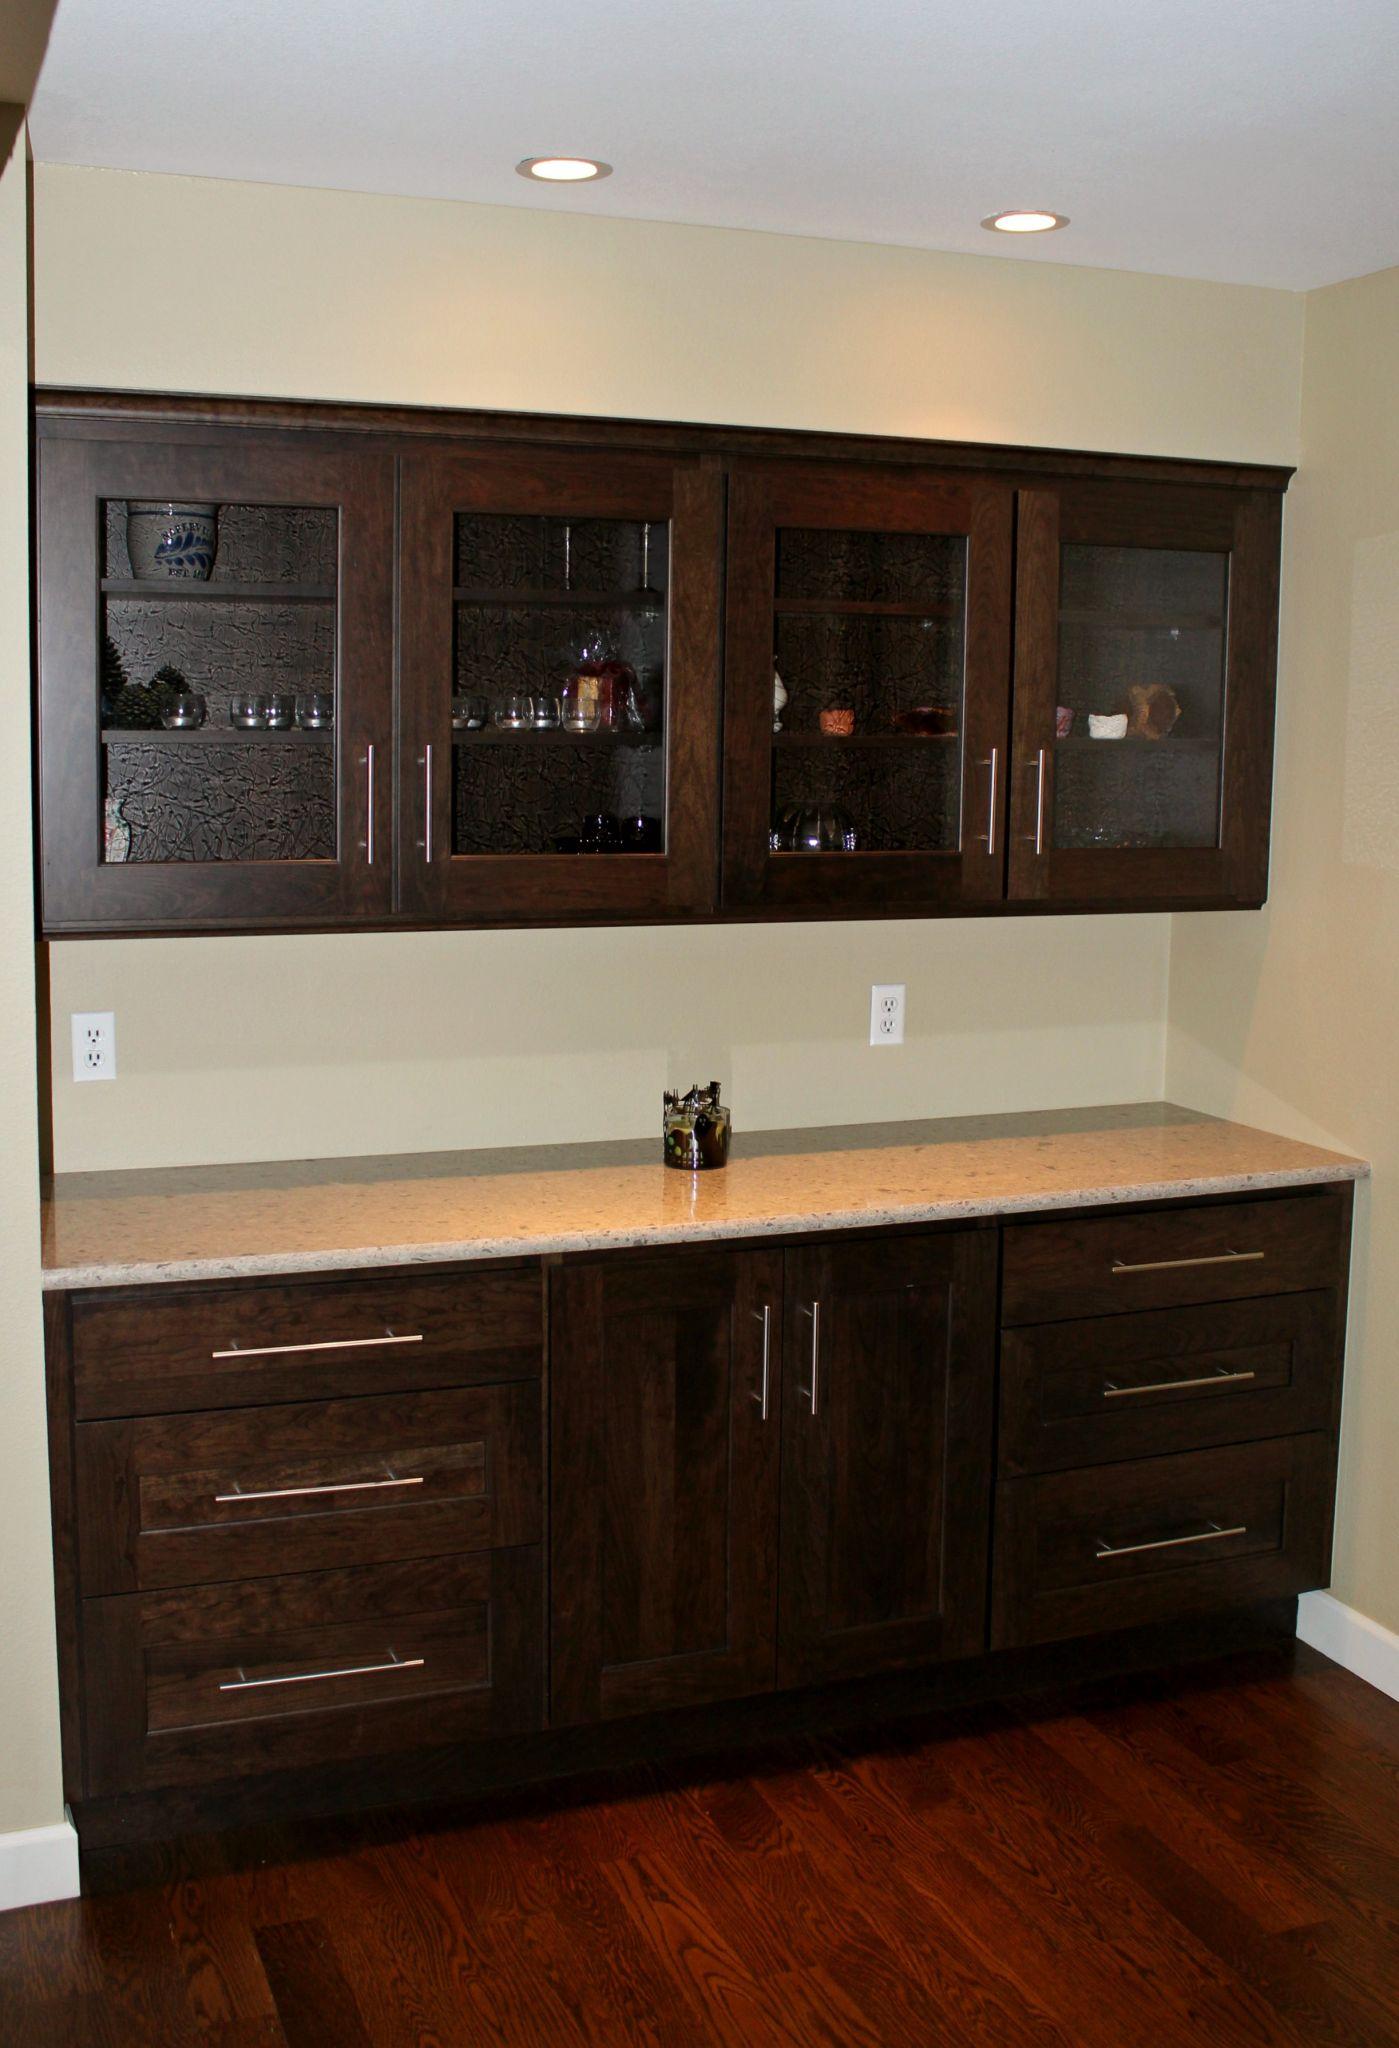 Crystal Cabinet Works | BKC Kitchen and Bath